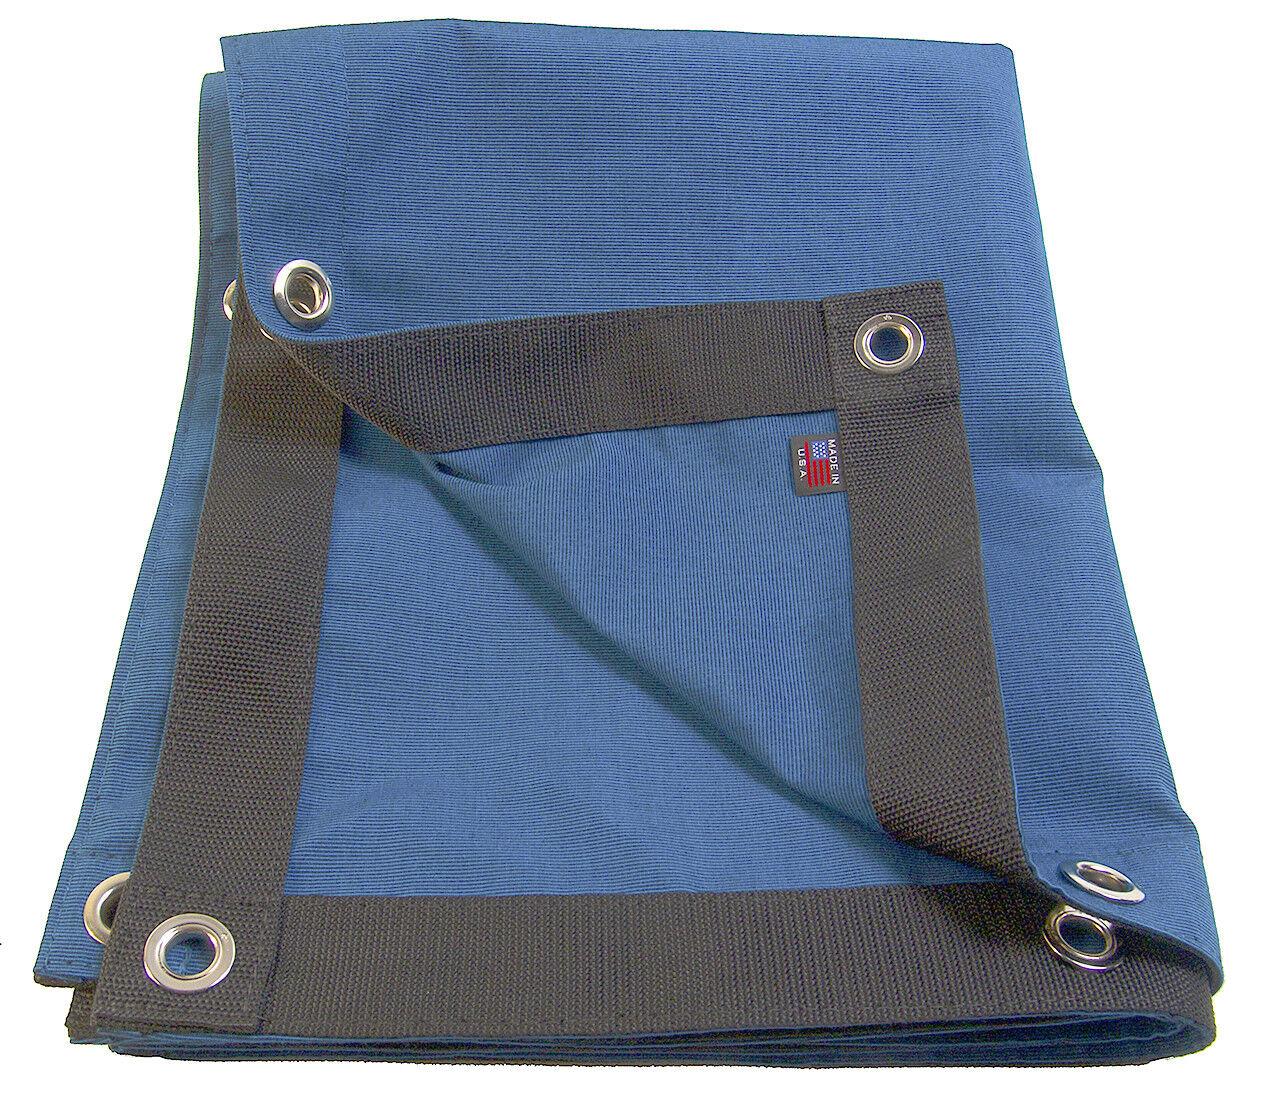 Sunbrella Tarp, Royal bluee Tweed w  Rolled Rim Spur Grommets, 9 16